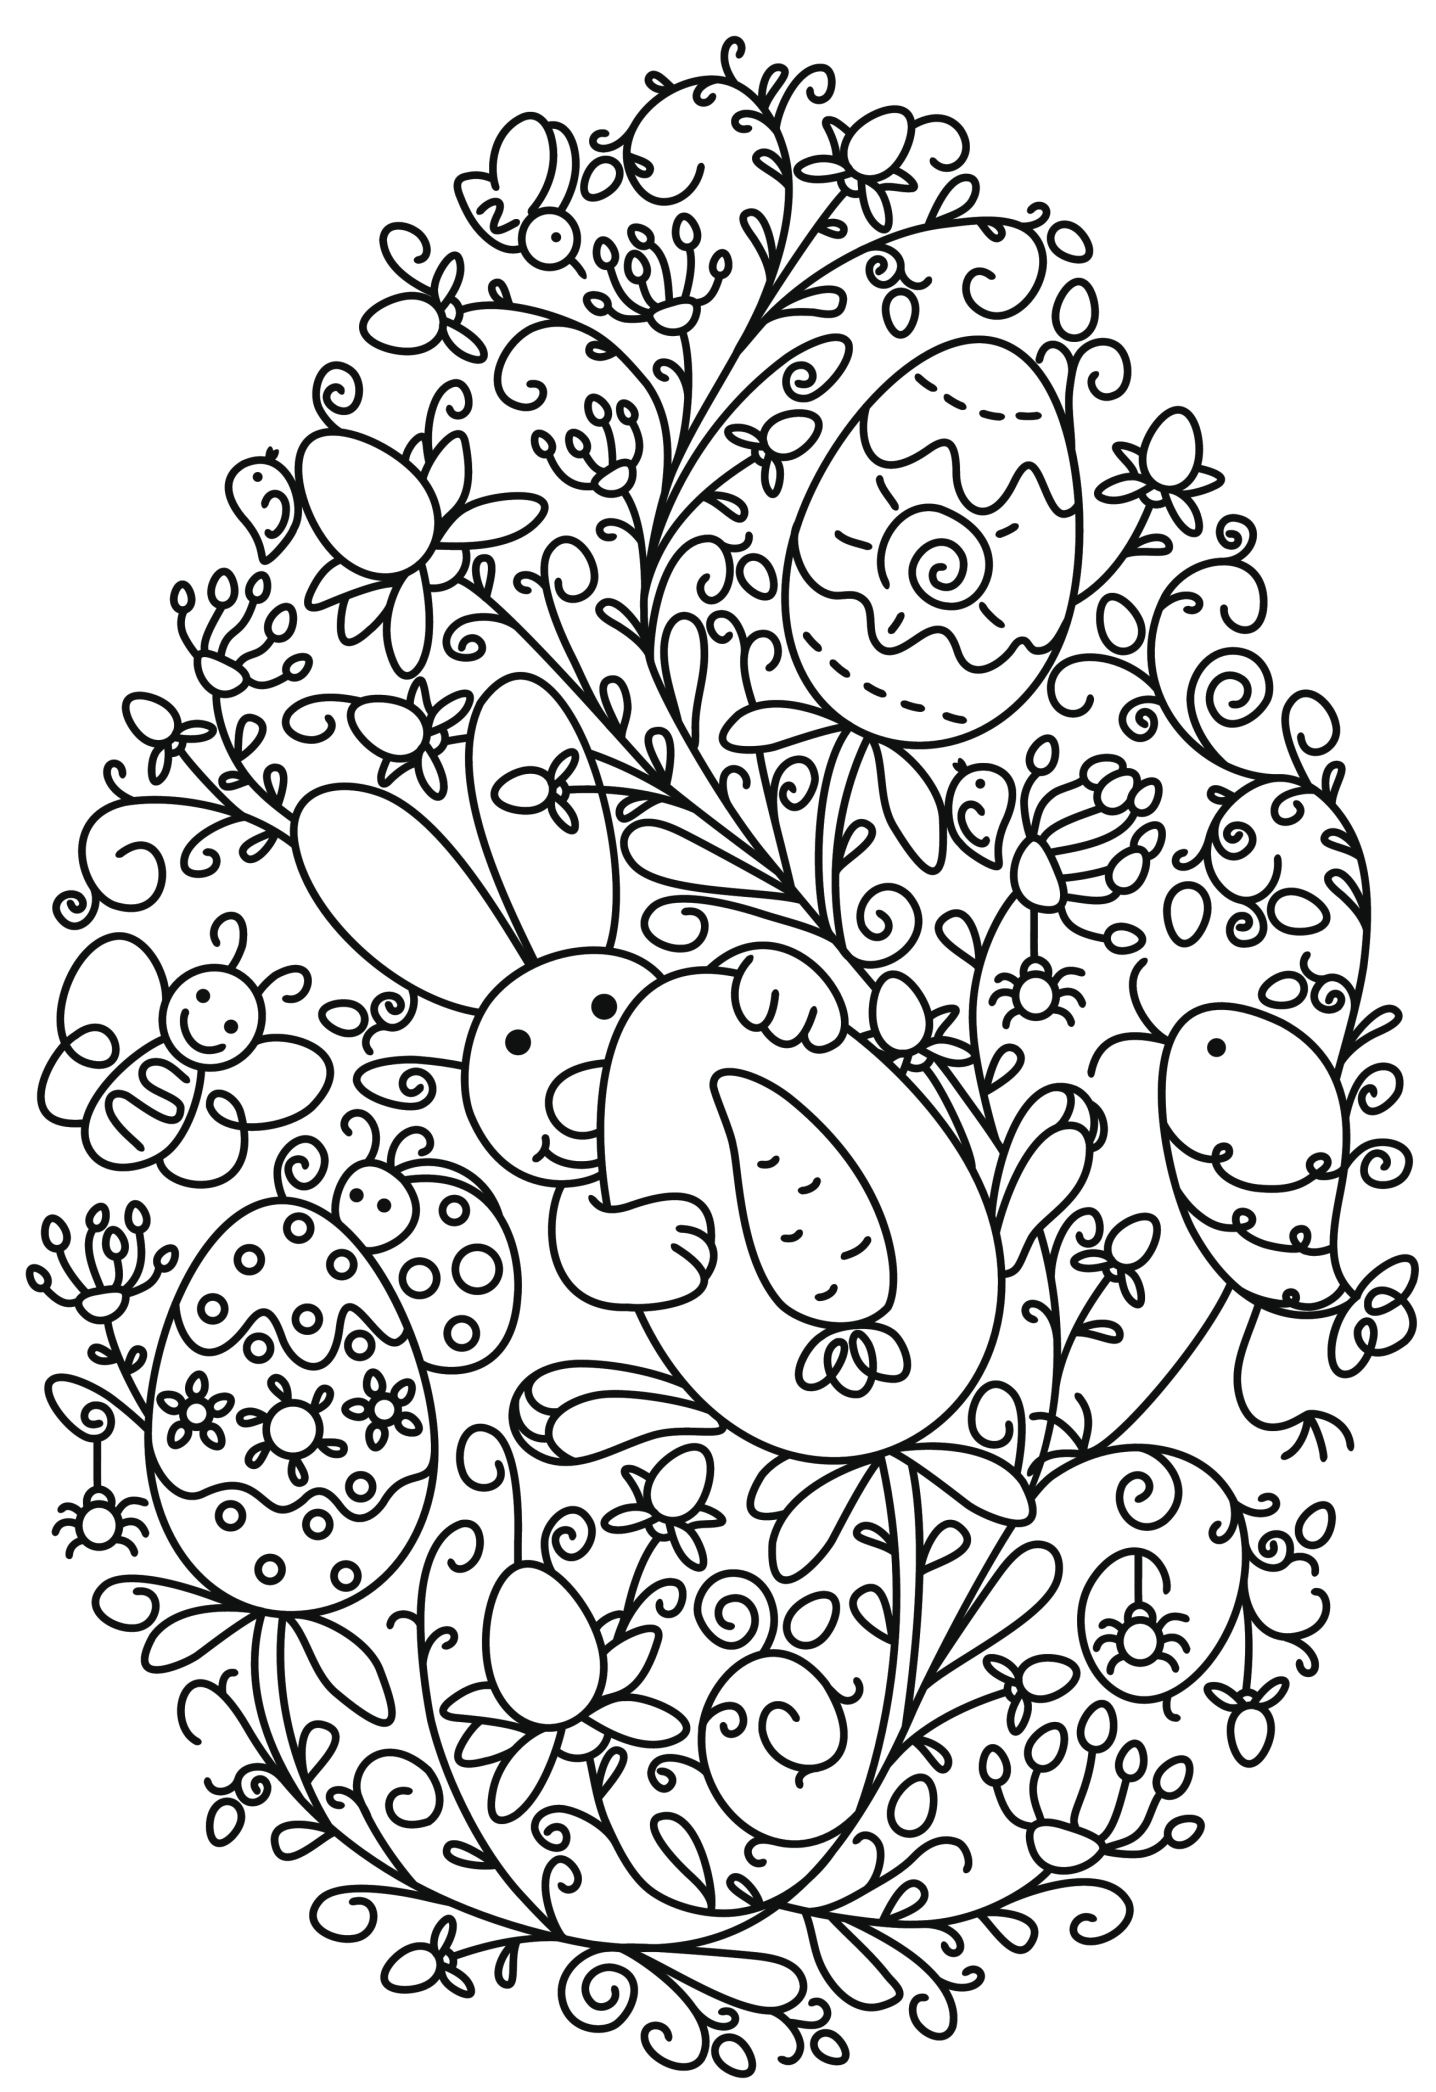 Dibujos-de-Pascua-para-imprimir | Easter - Crafts | Pinterest ...